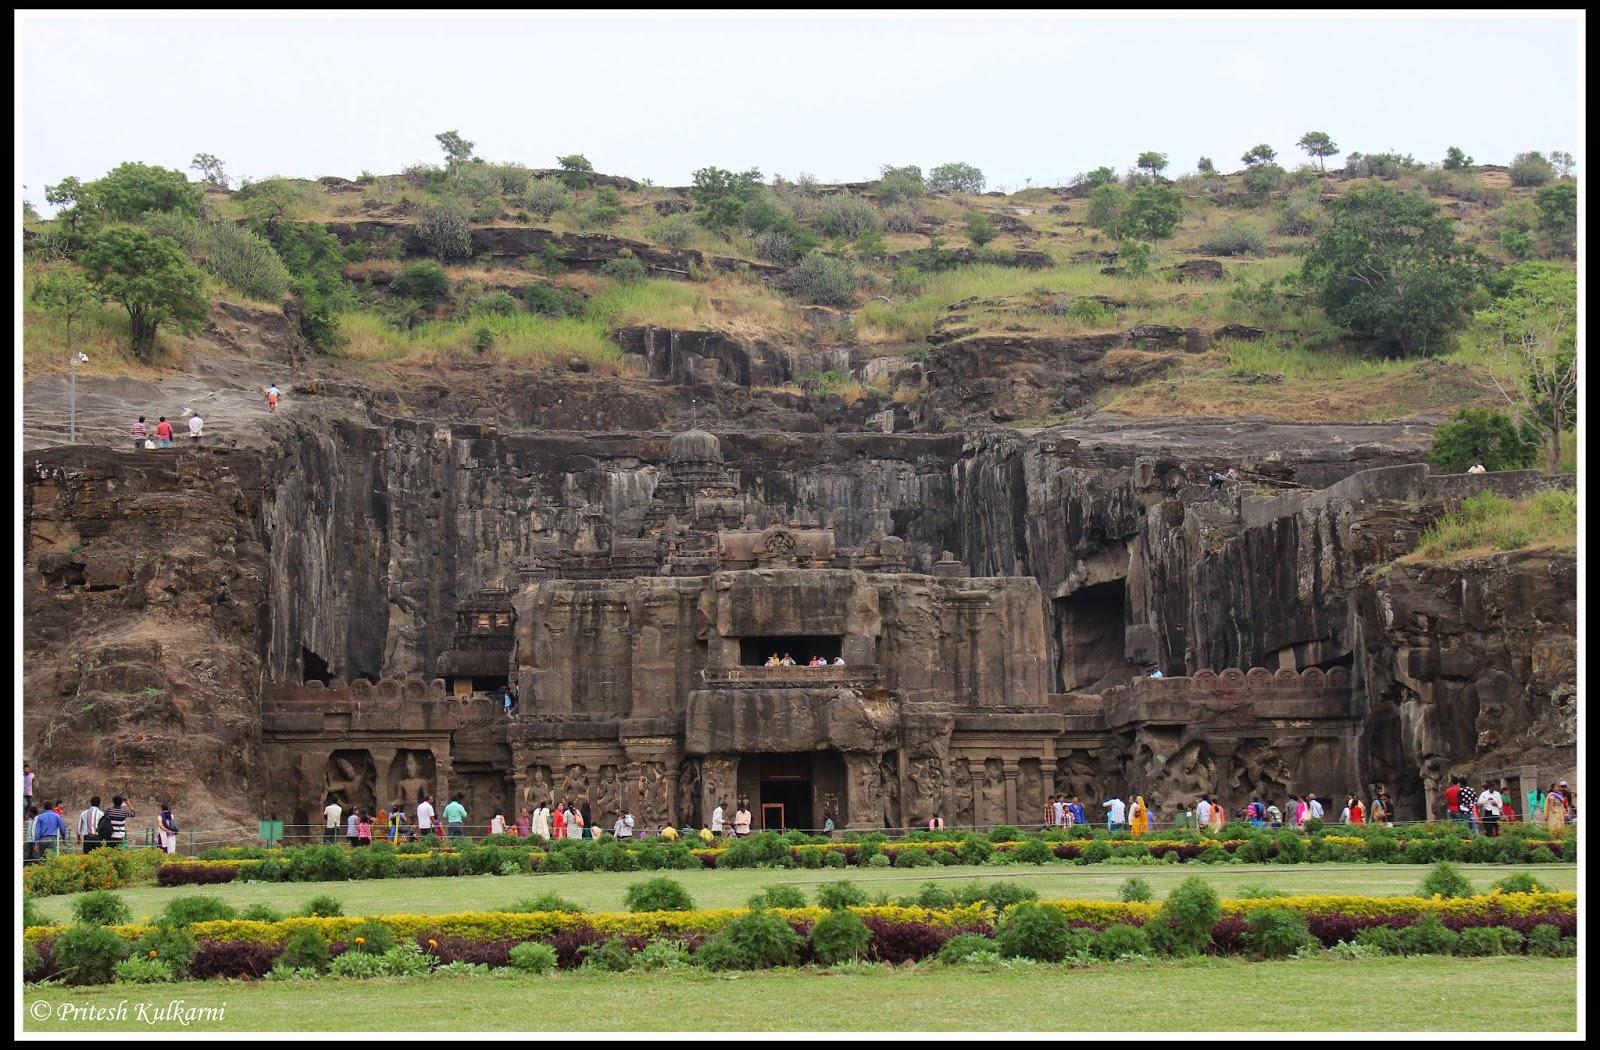 The Kailashnatha Temple